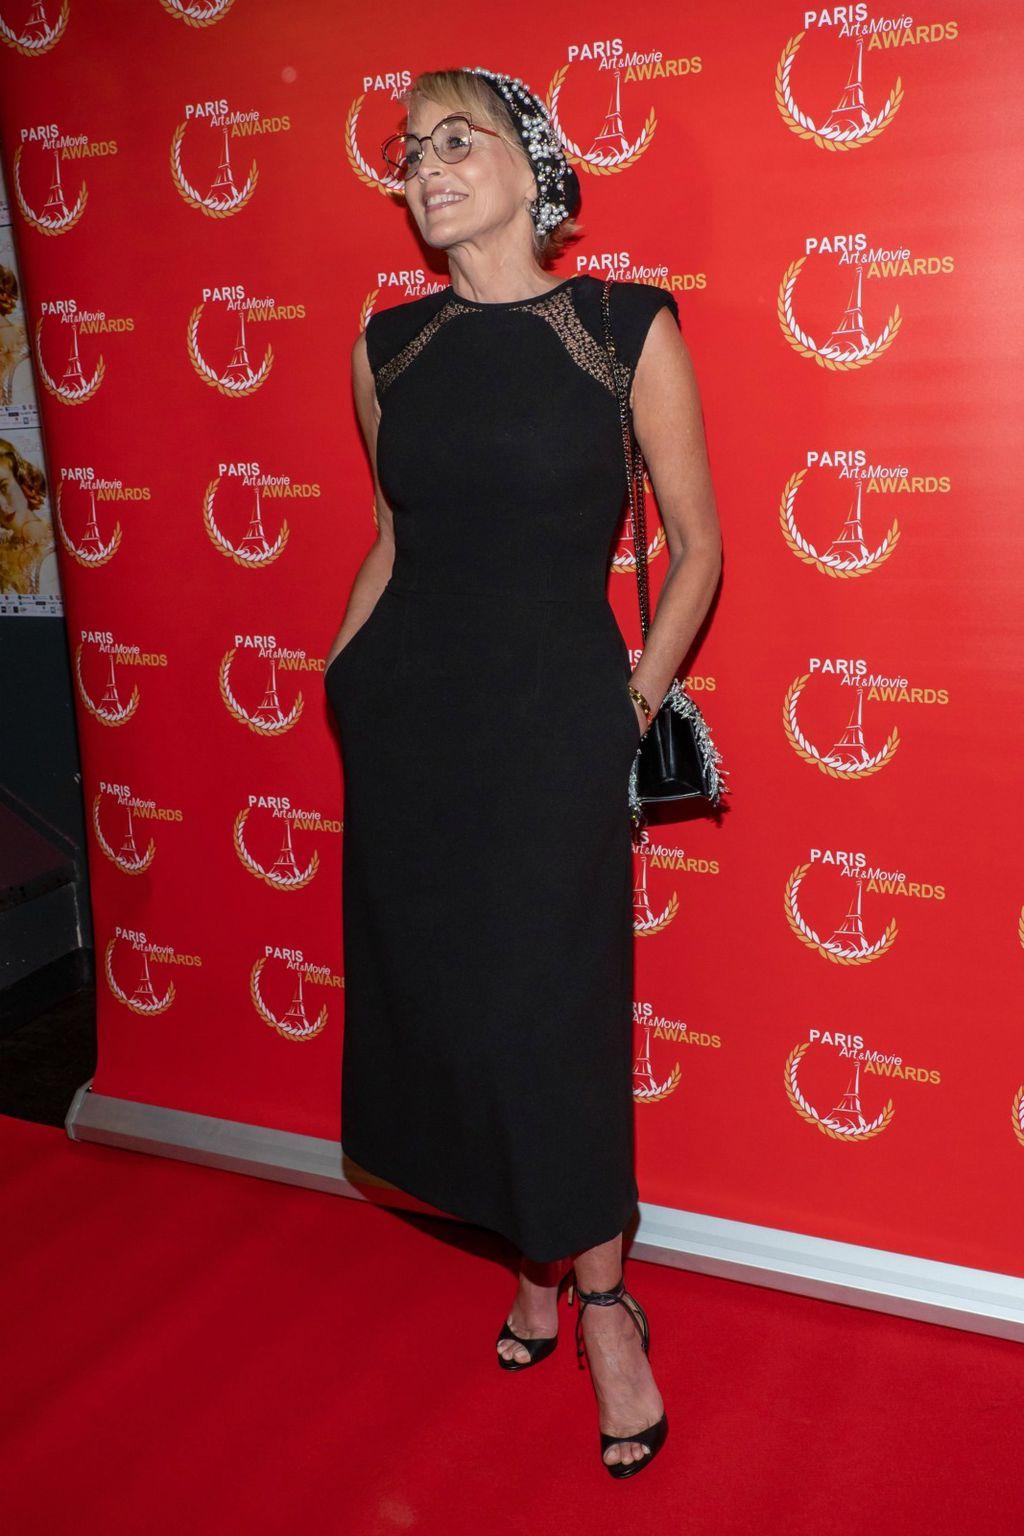 Sharon Stone na dodjeli nagrada PAMA - 2